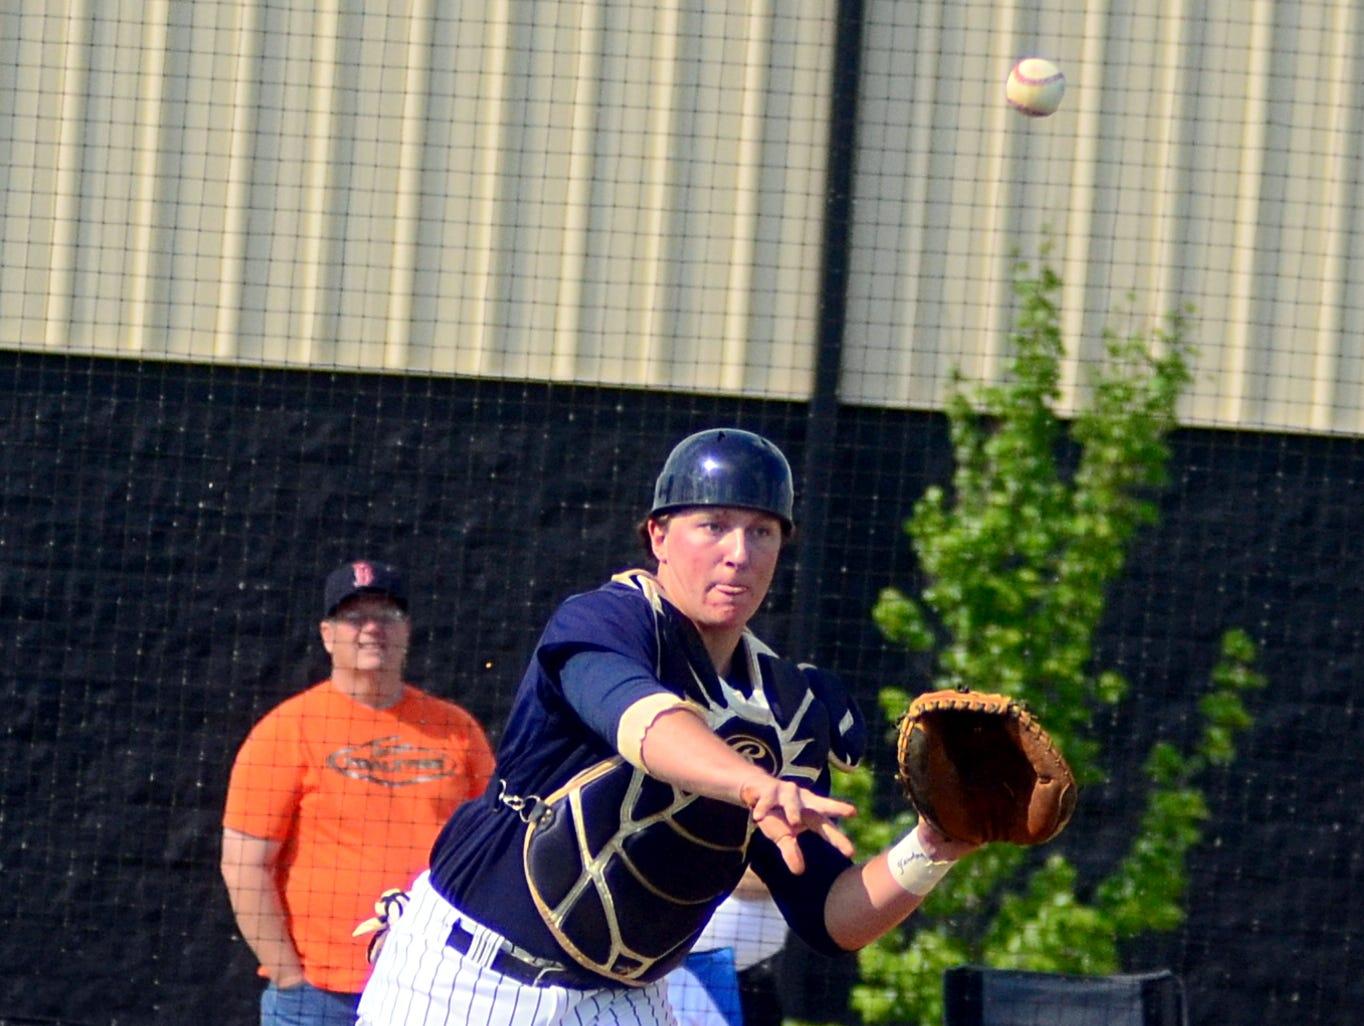 Beech High junior catcher Ryan Mortensen throws to first base during second-inning action. Mortensen singled in the second inning.